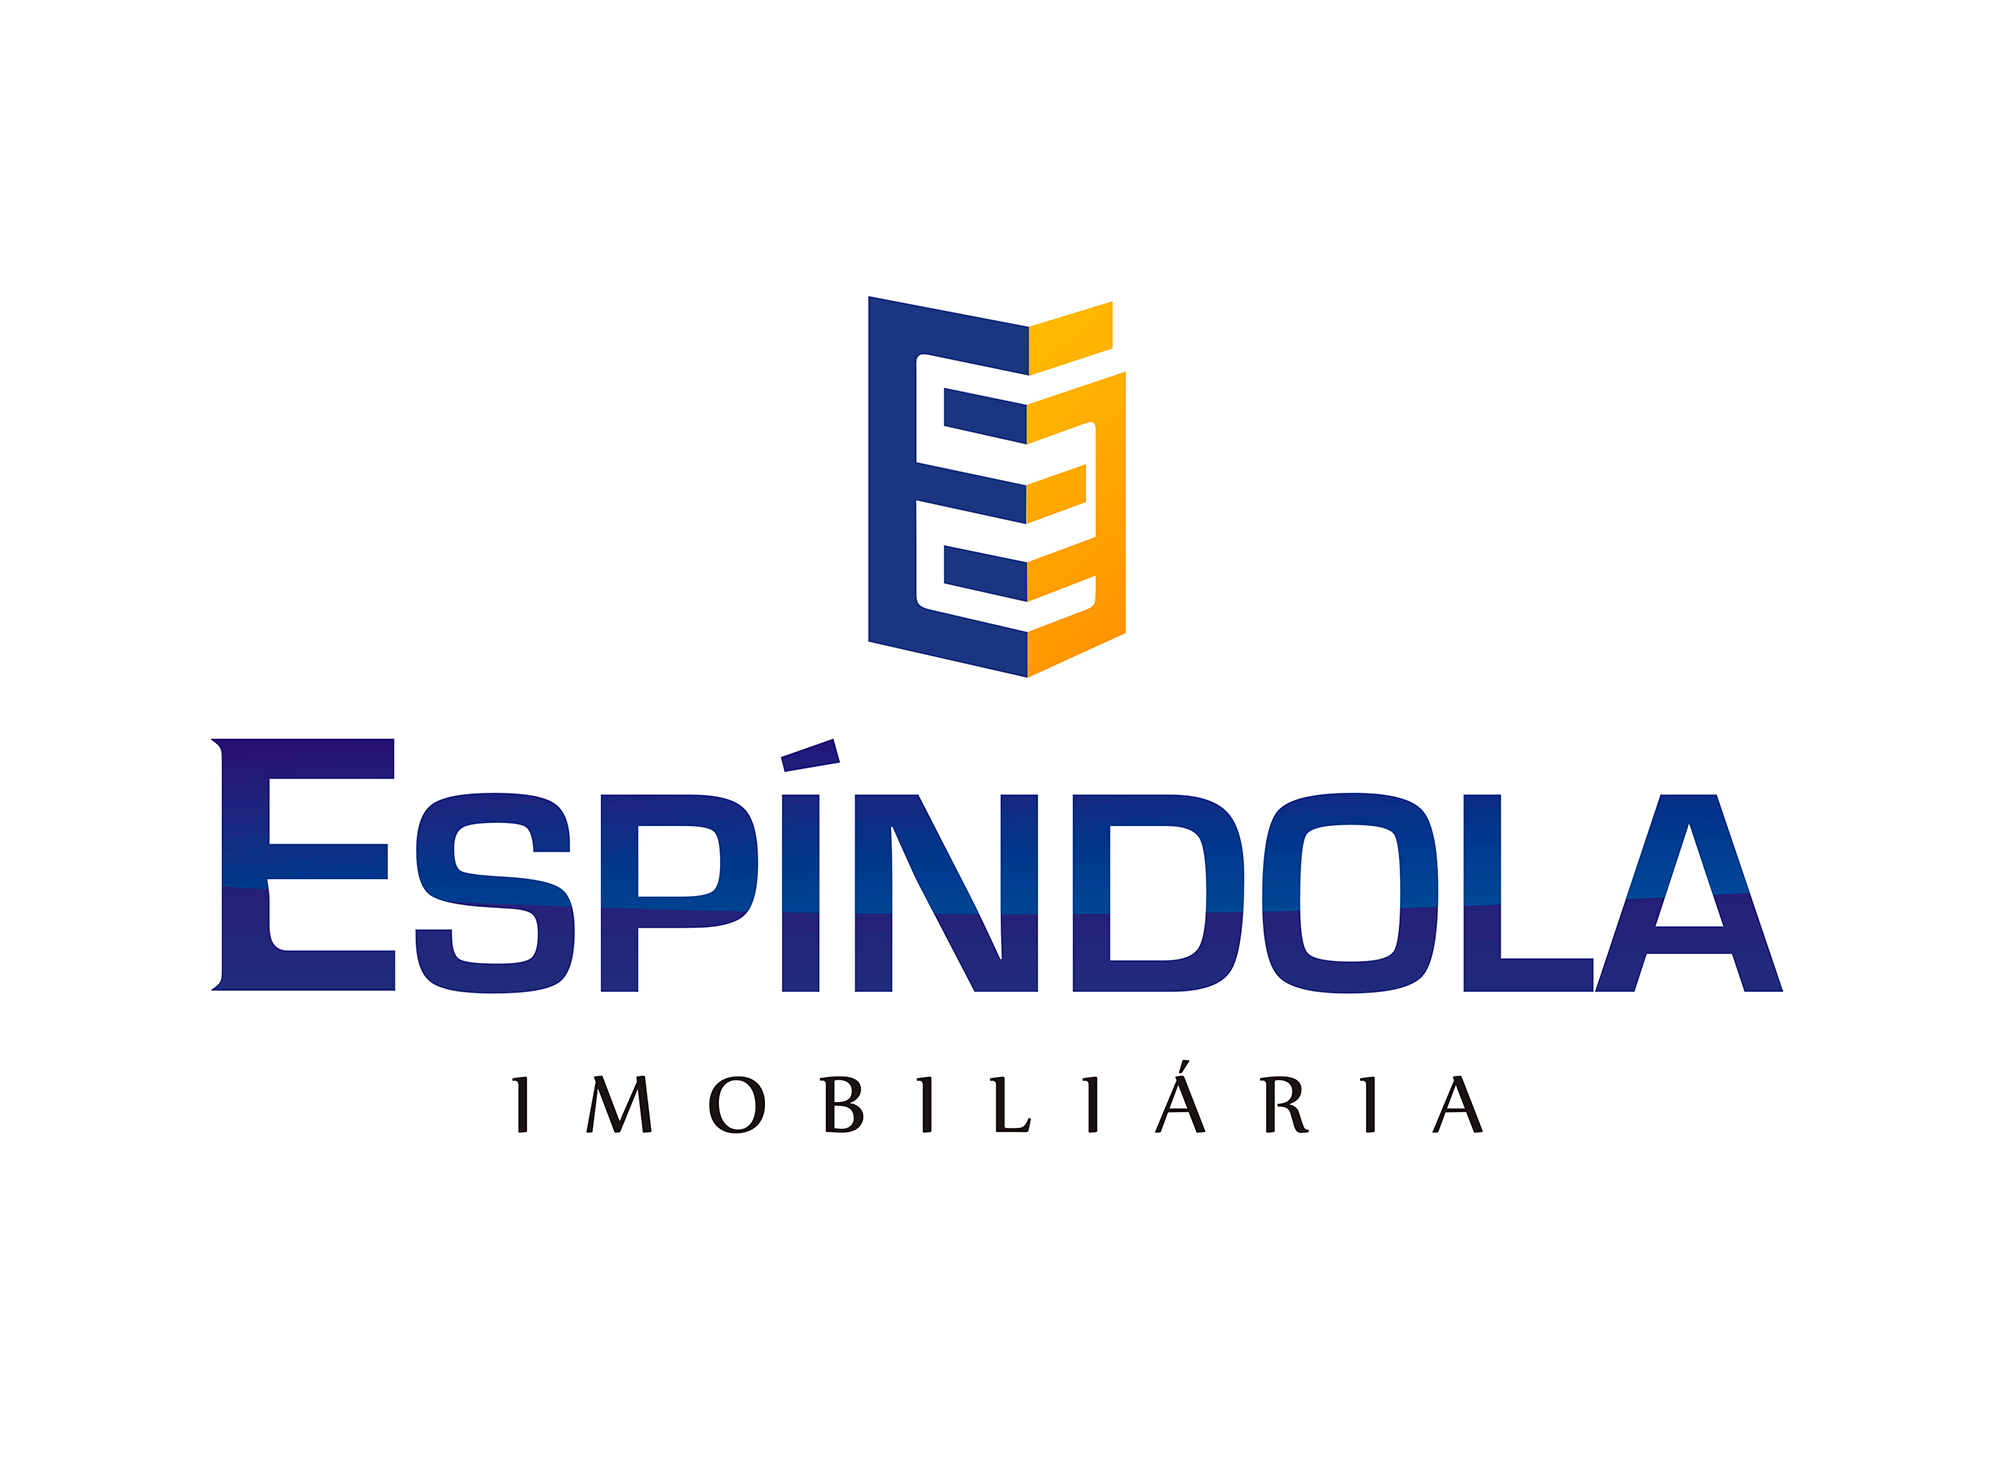 espindola-imobiliaria-clientes-atendidos-agencia-diretriz-digital-marketing-fortaleza